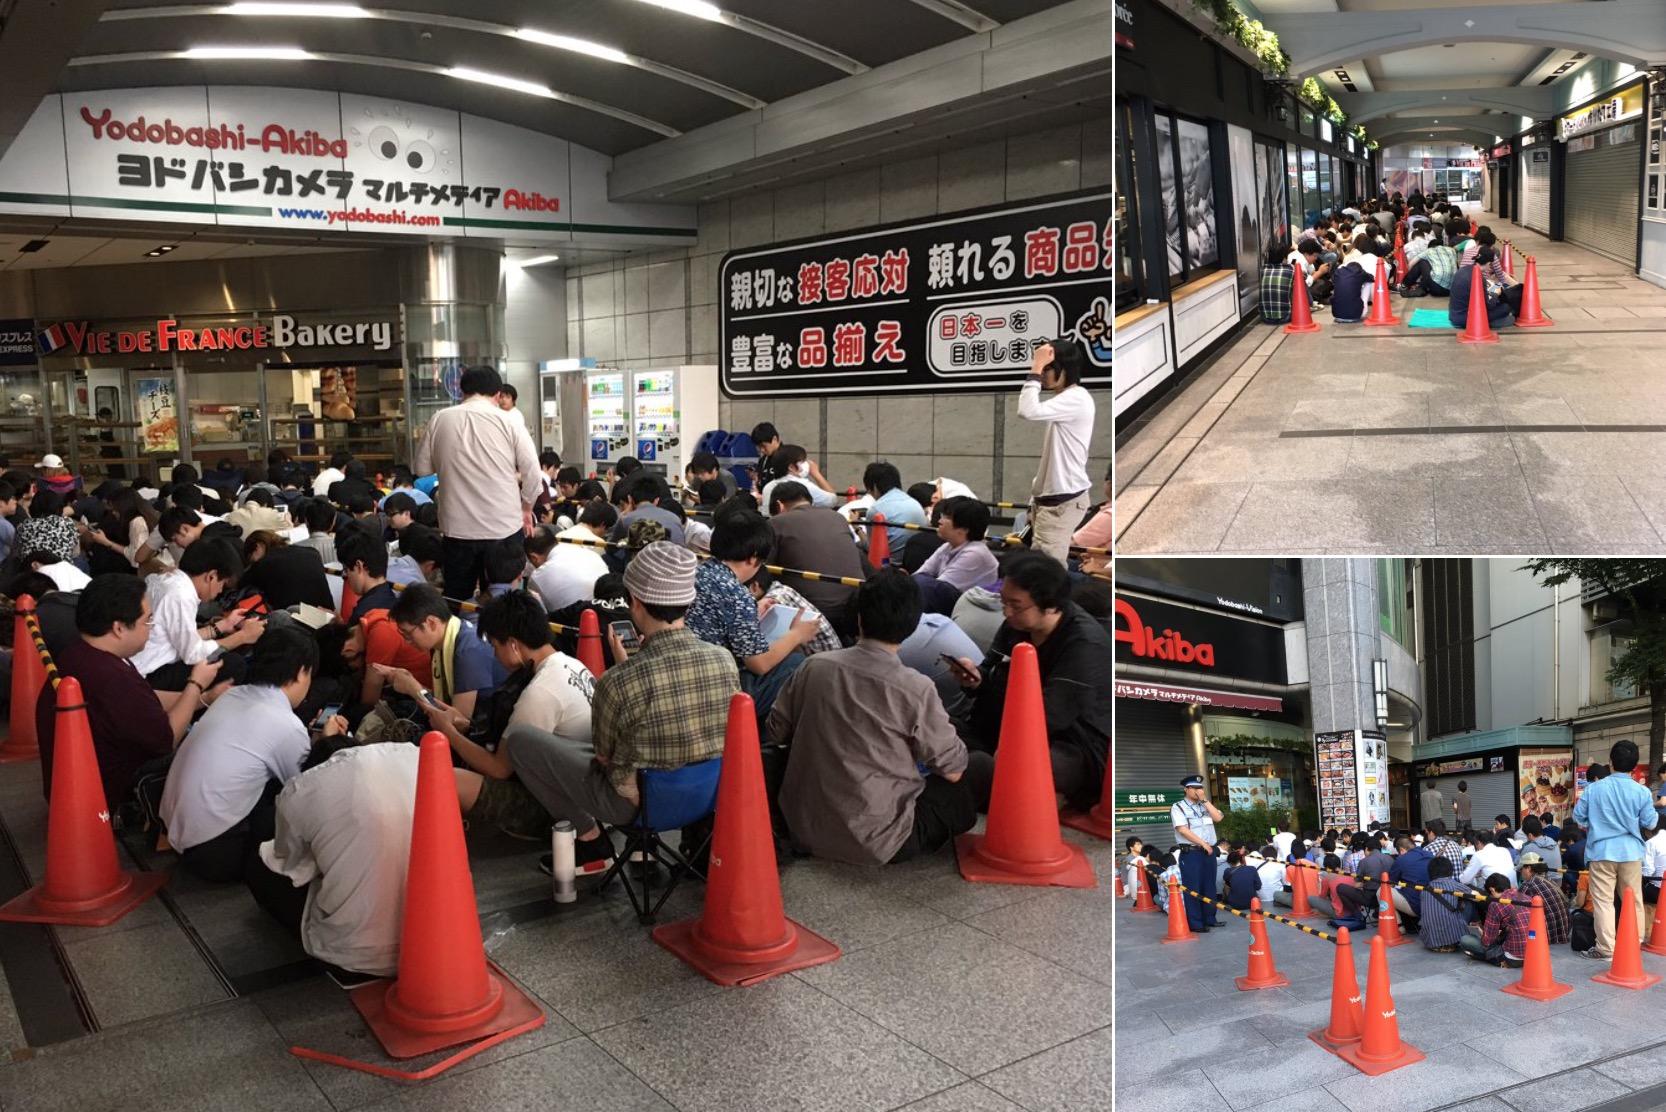 PlayStation VR, lunghe code in Giappone per i pre-ordini